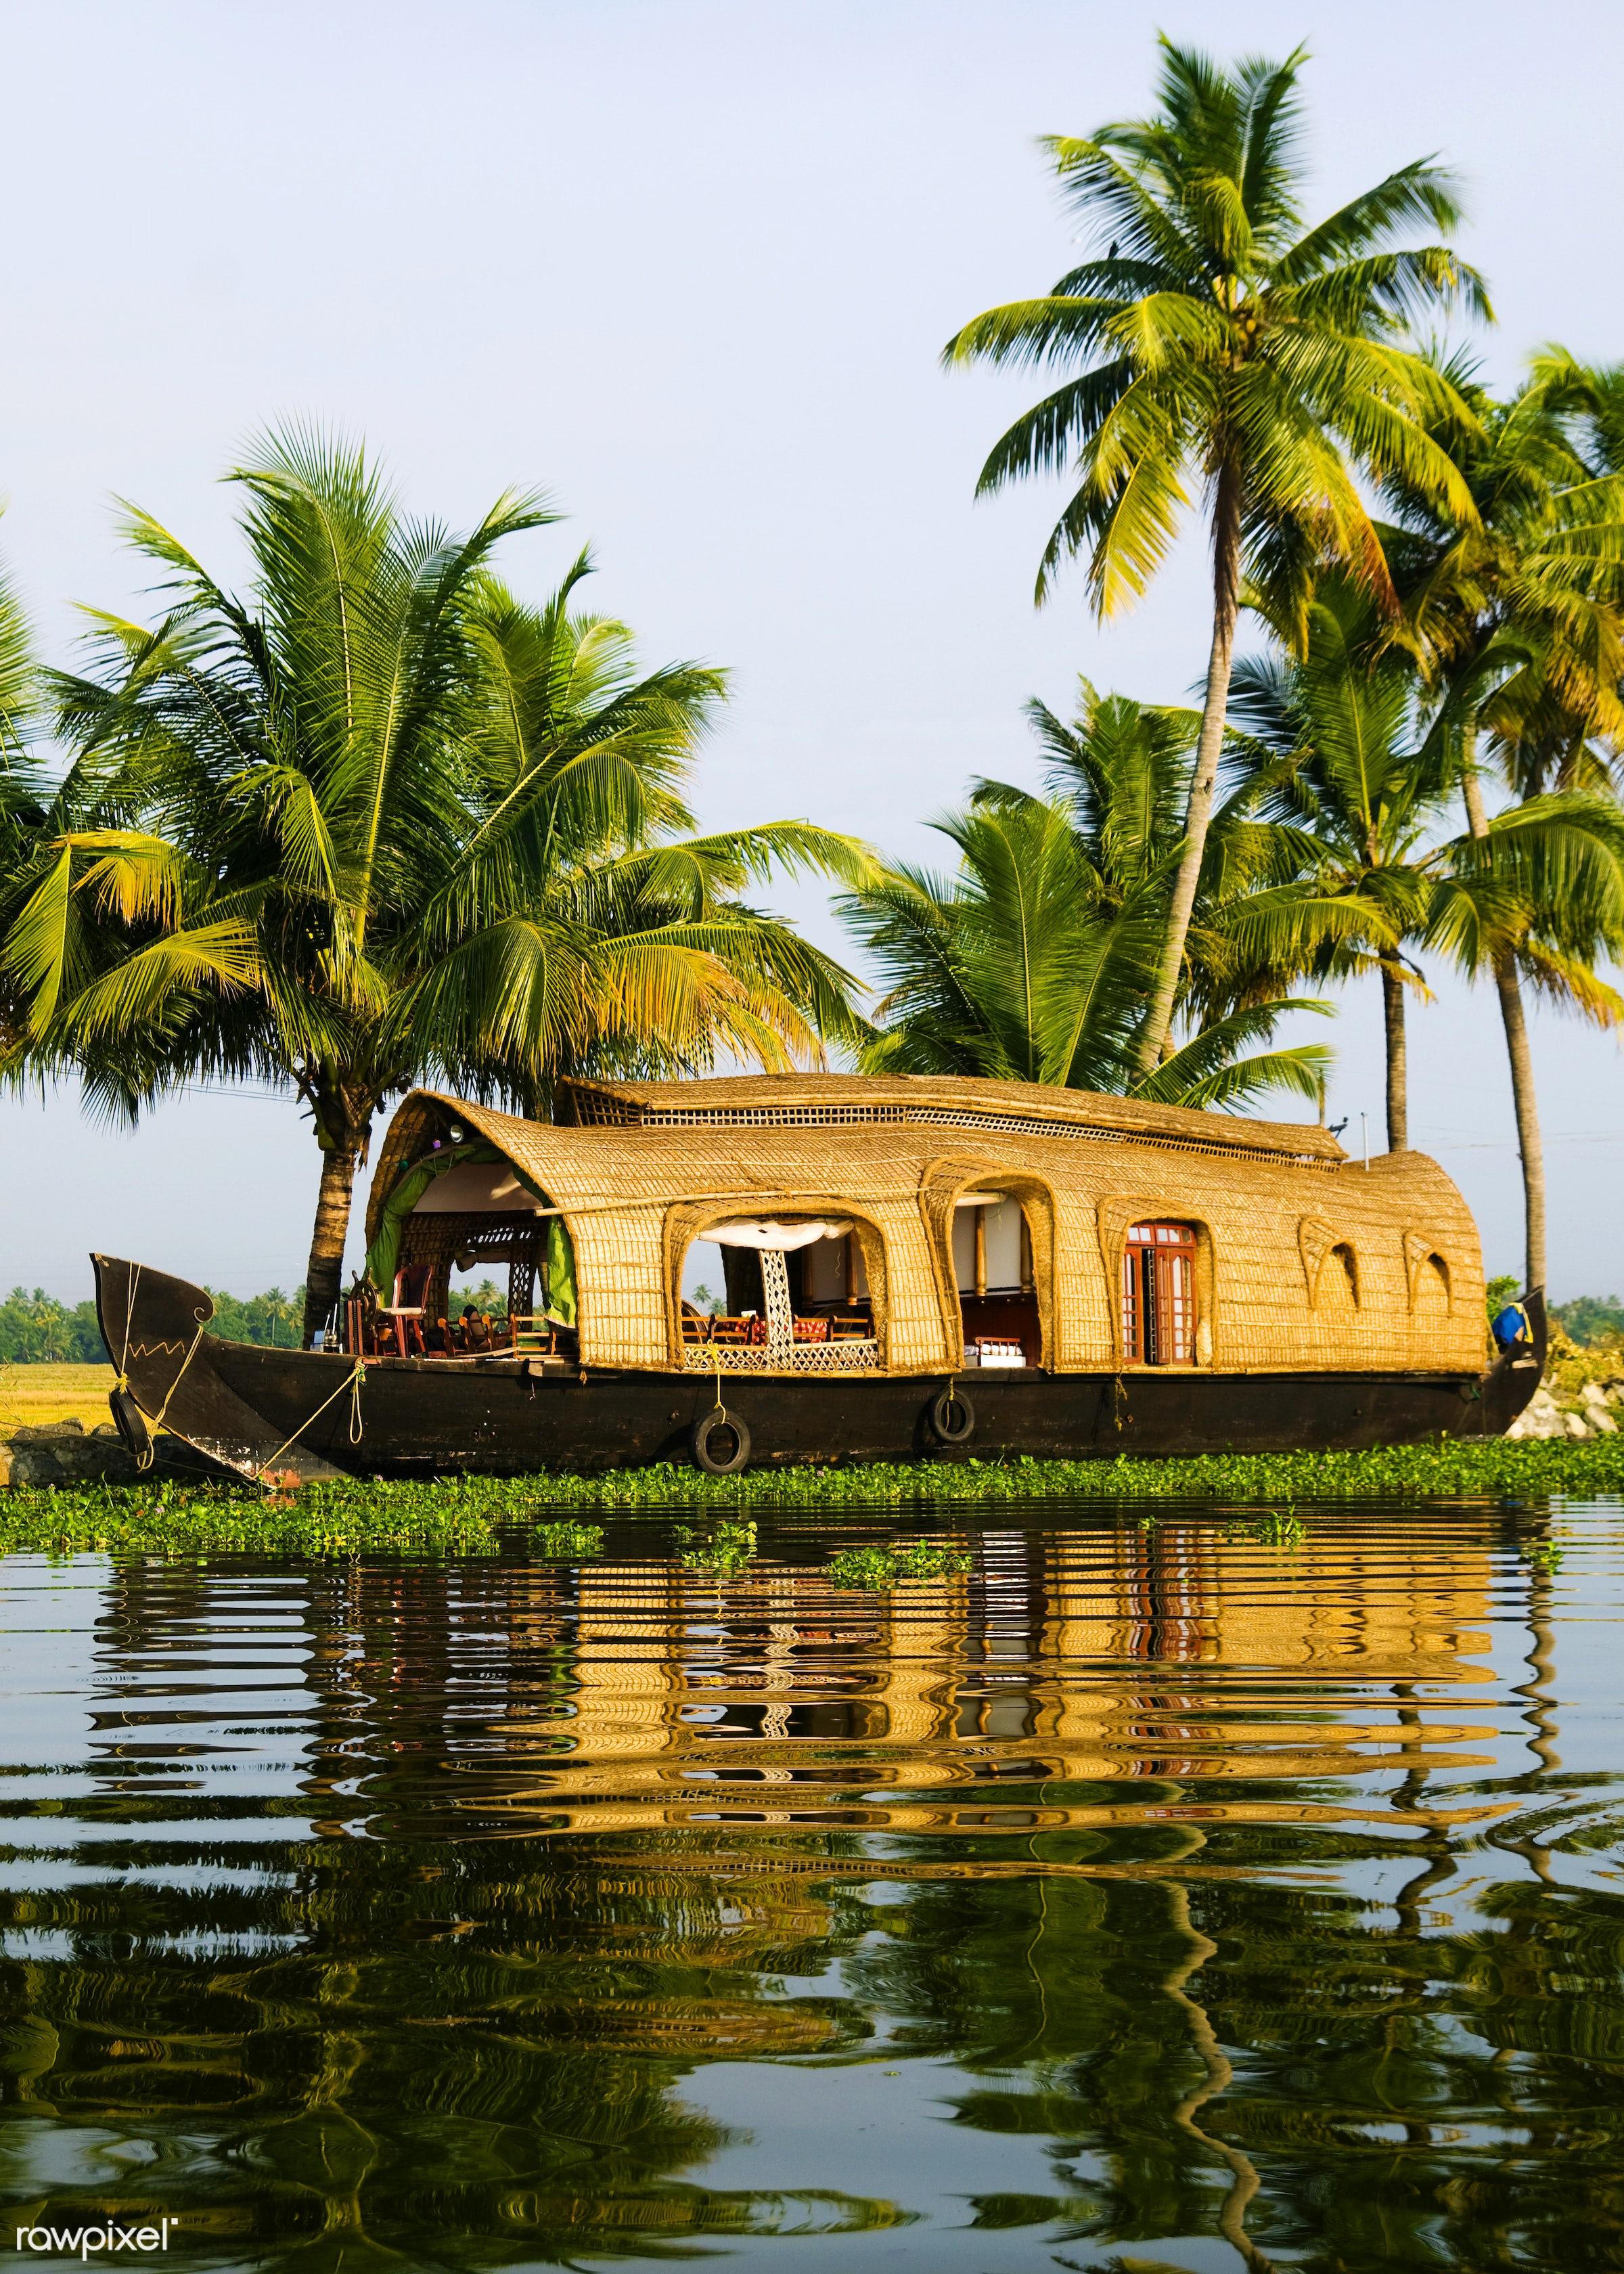 Houseboat on Kerala backwaters, Kerala, India - houseboat, travel, asia, backwater, canal, coconut palm tree, cruise ship,...